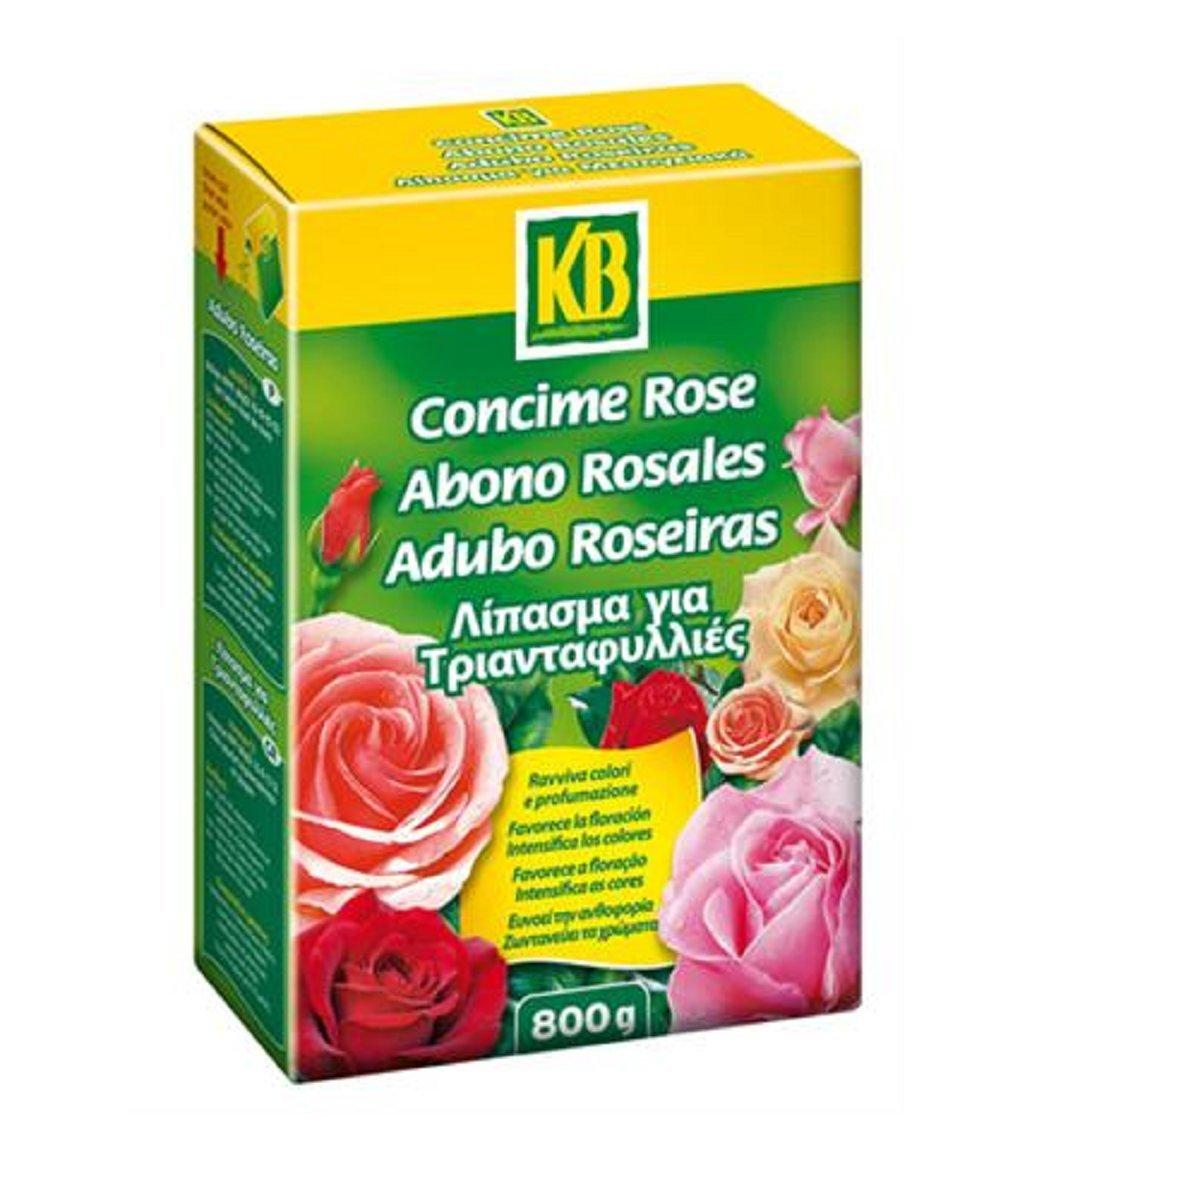 CONCIME GRANULARE 800GR ROSE KB 6377 PER ROSE CESPUGLI FIORITI E ROSACEE ITAL-AGRO